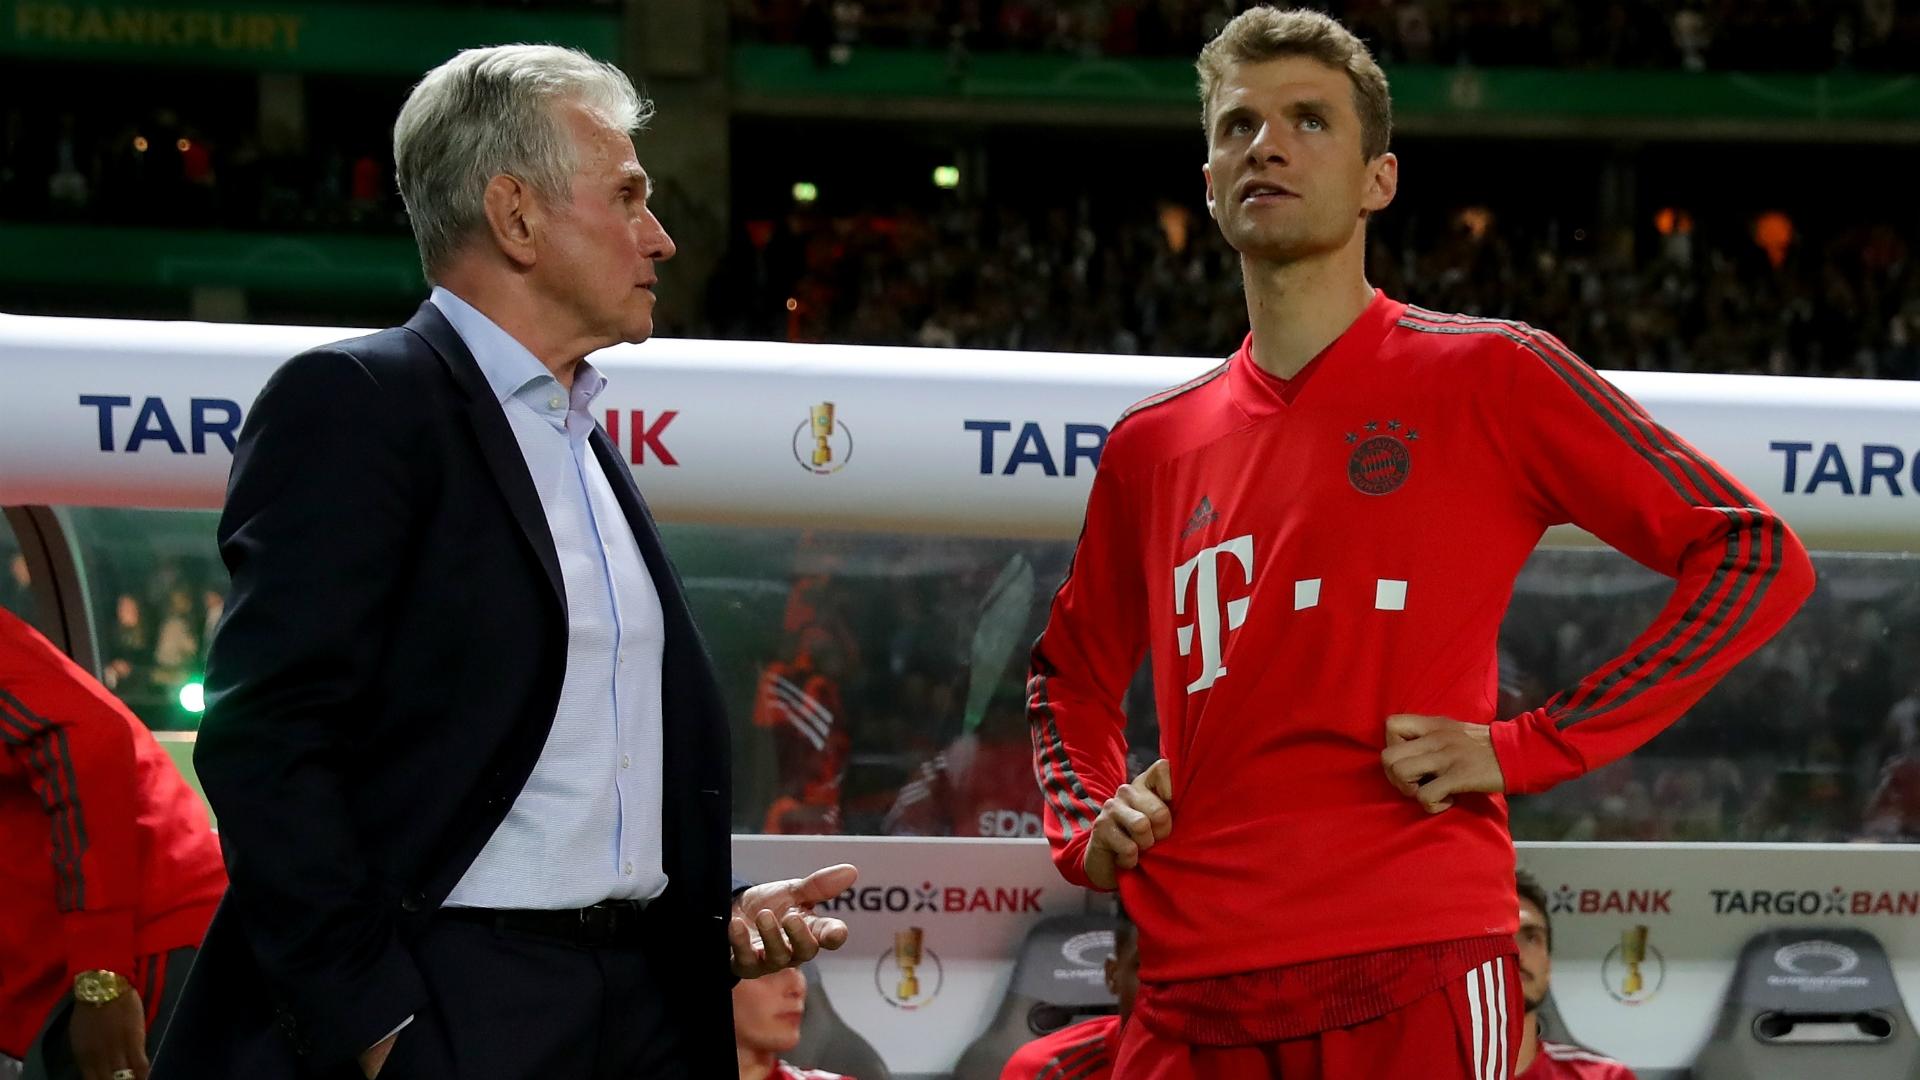 Jupp Heynckes and Thomas Muller - Bayern Munchen